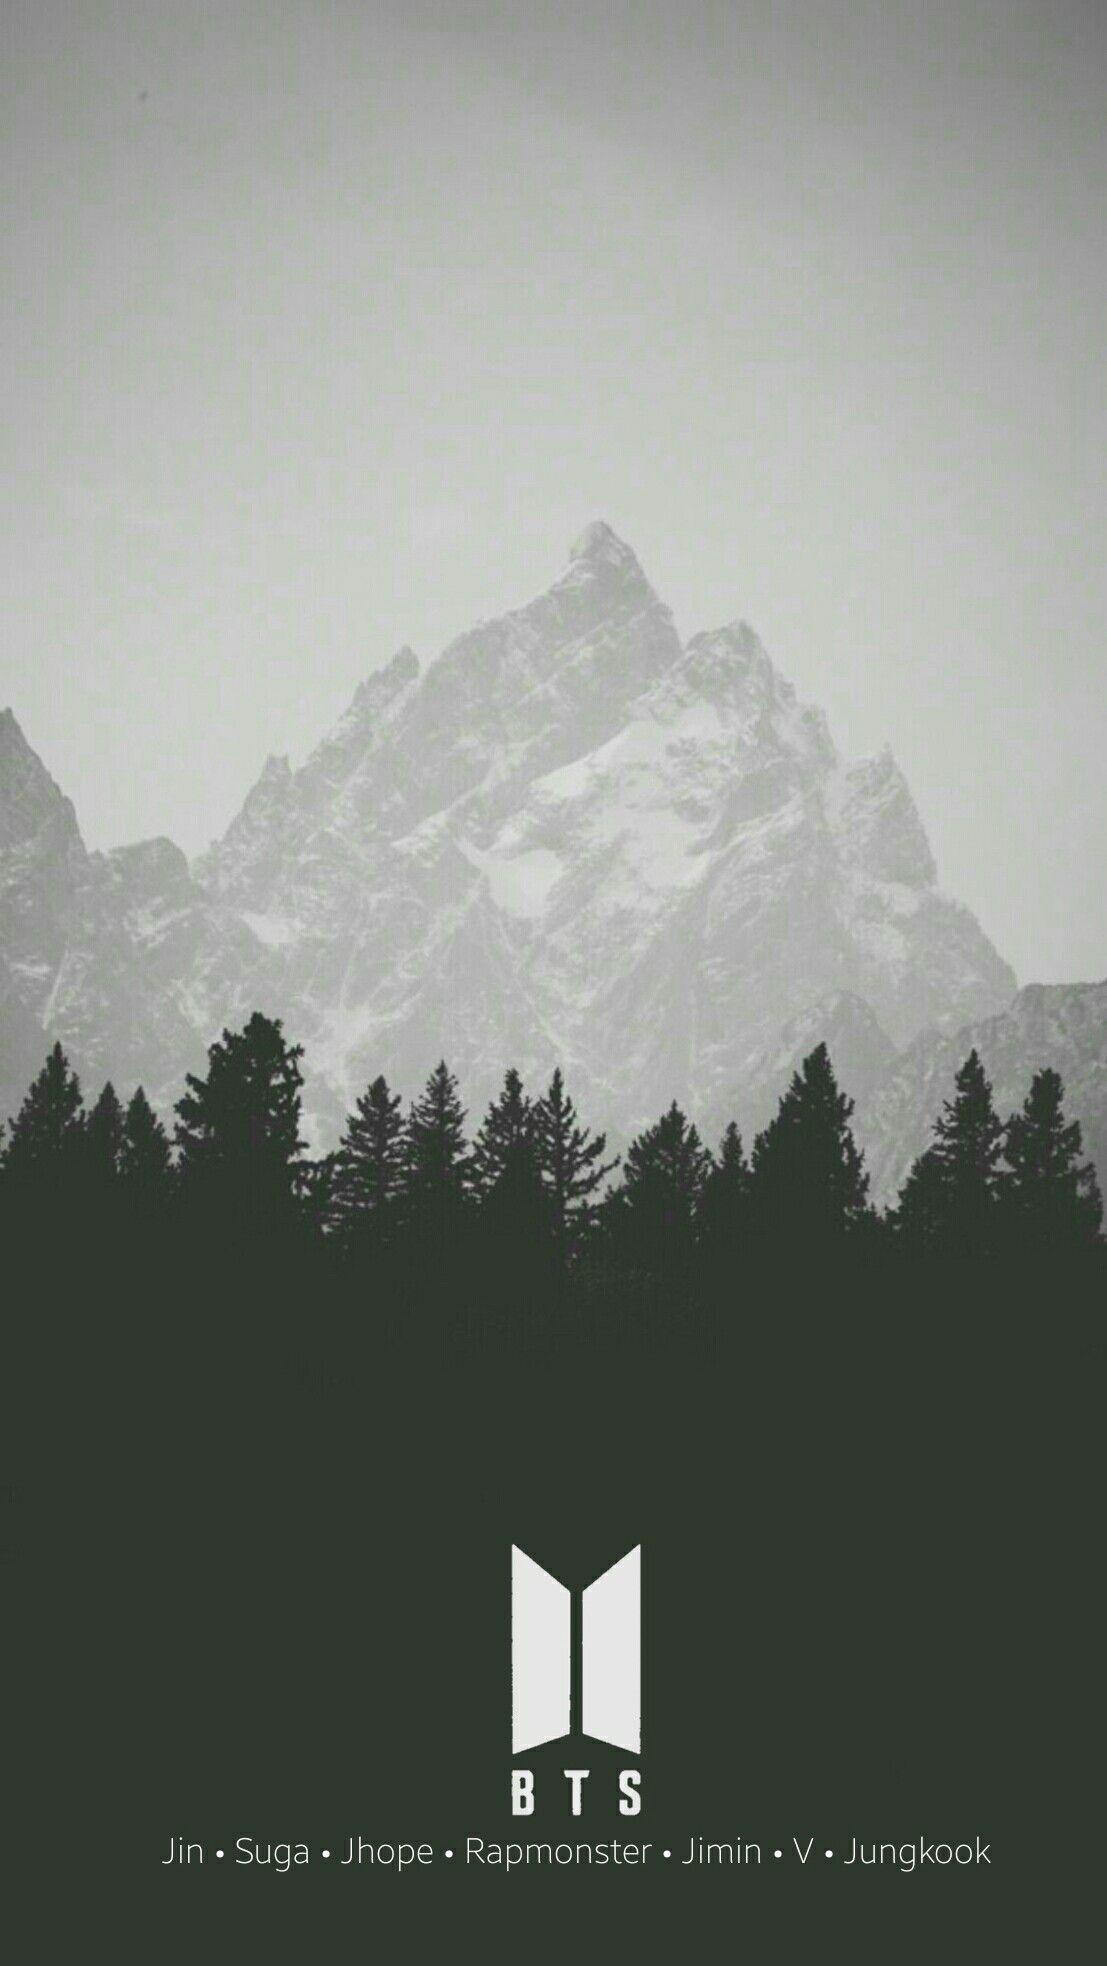 Bts Wallpaper C Extraordinaryarmy Phone Backgrounds Mountain